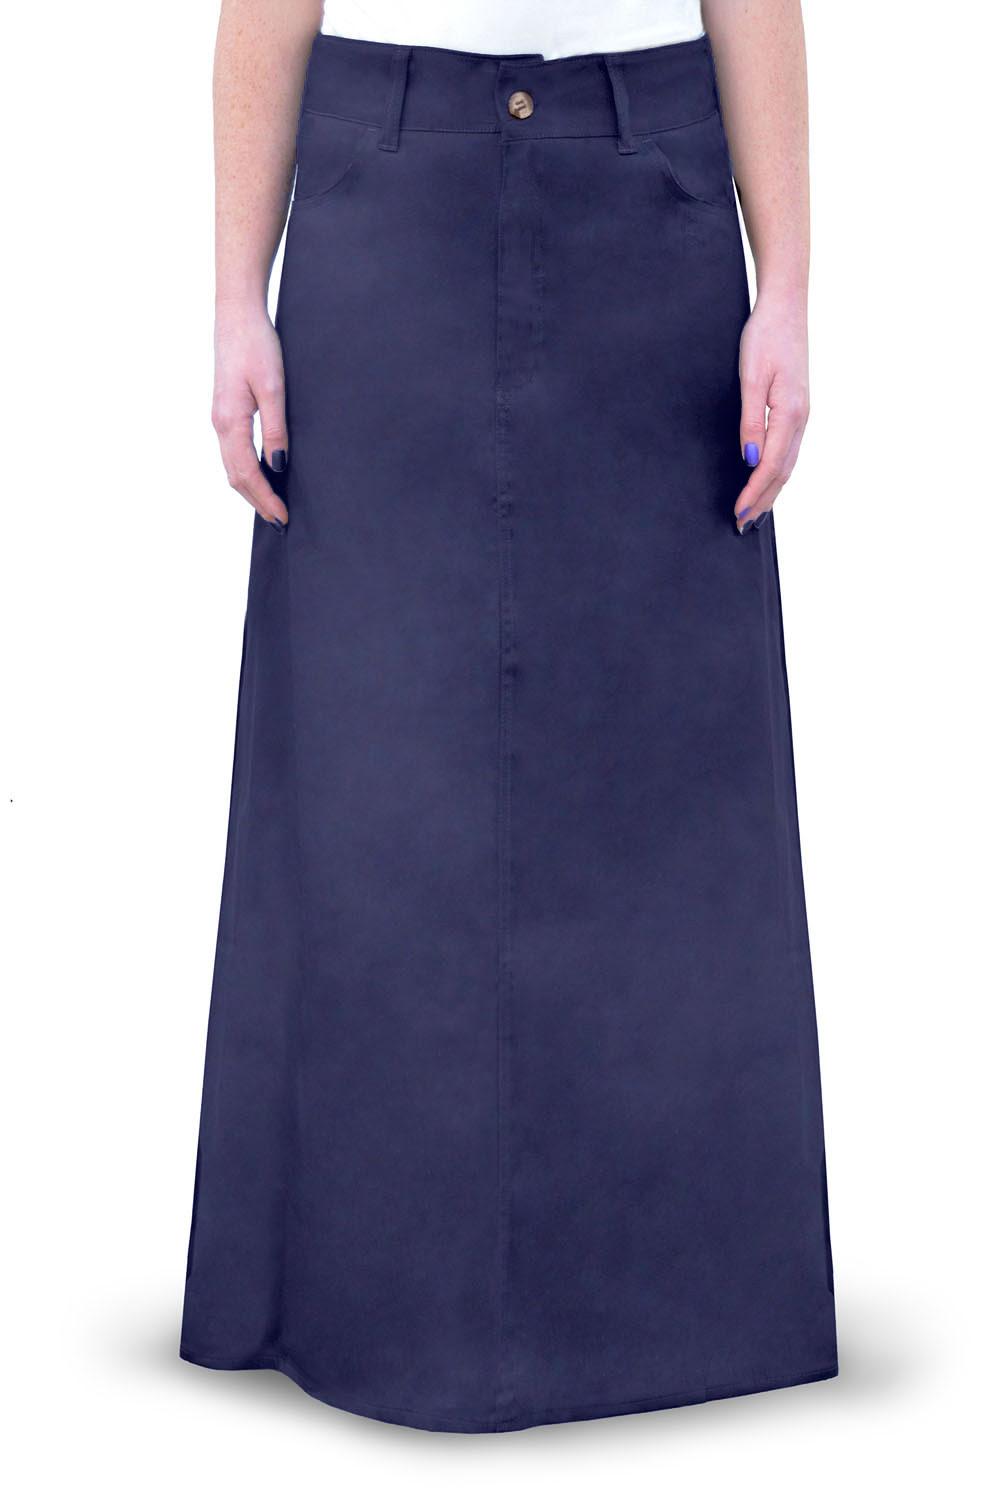 Kosher Casual Womenu0026#39;s Modest Long Cotton Twill Skirt | eBay